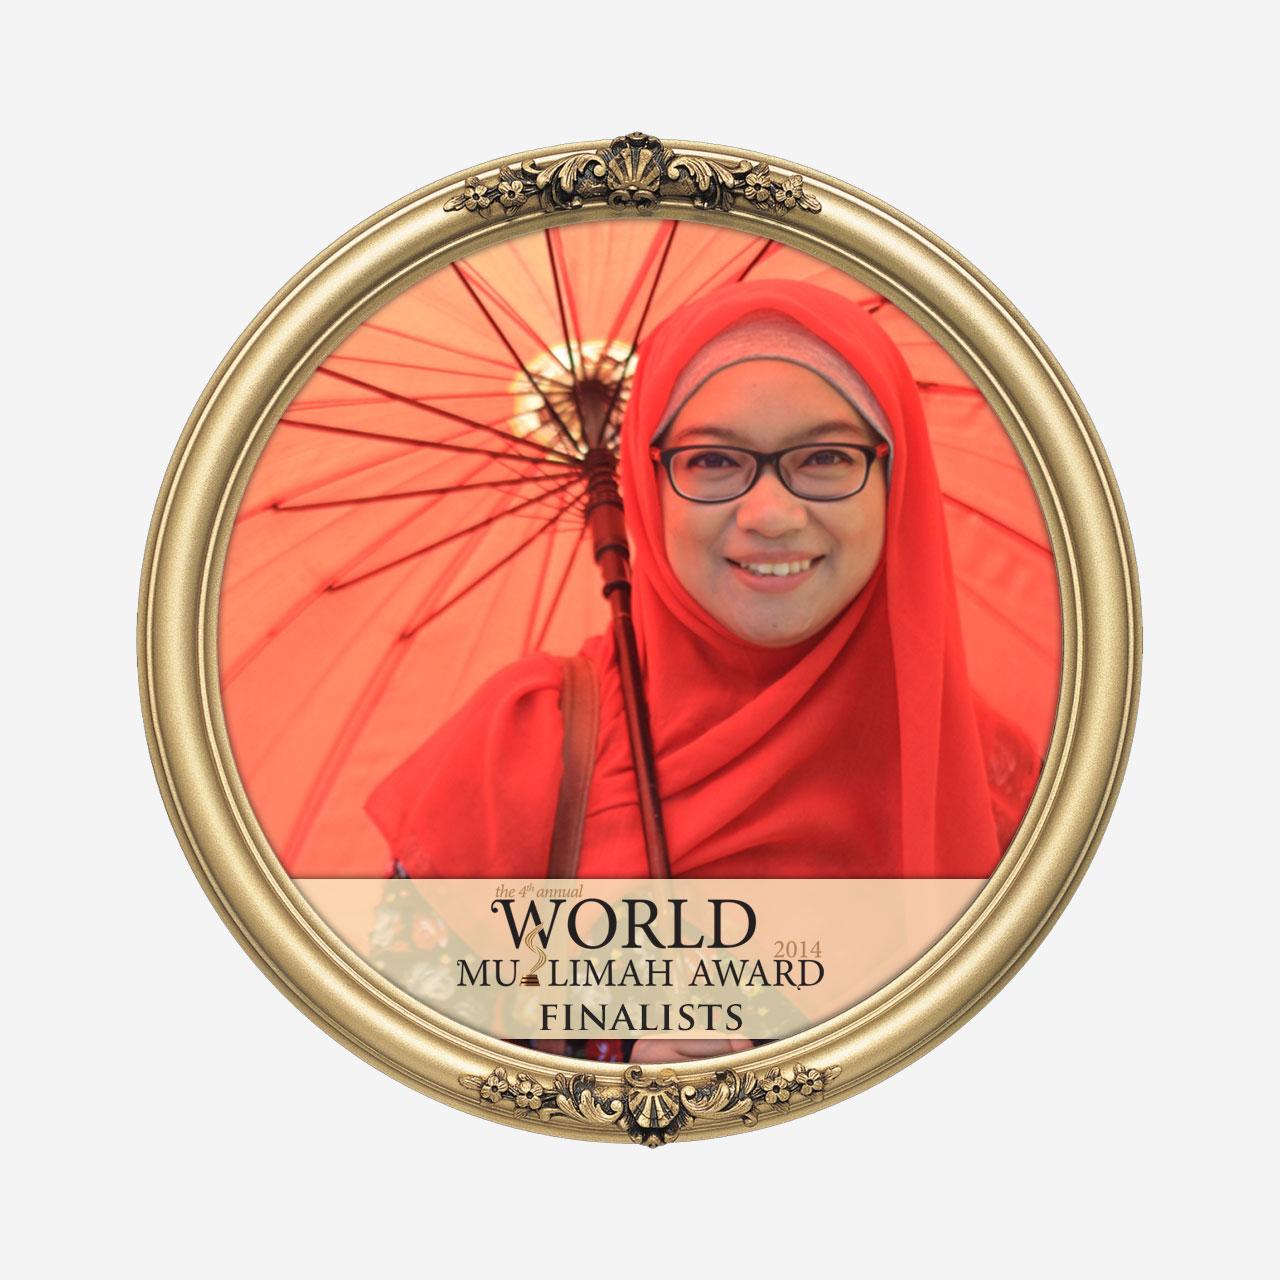 http://www.worldmuslimah.org/award2014/primadita-rahma-ekida-indonesia/